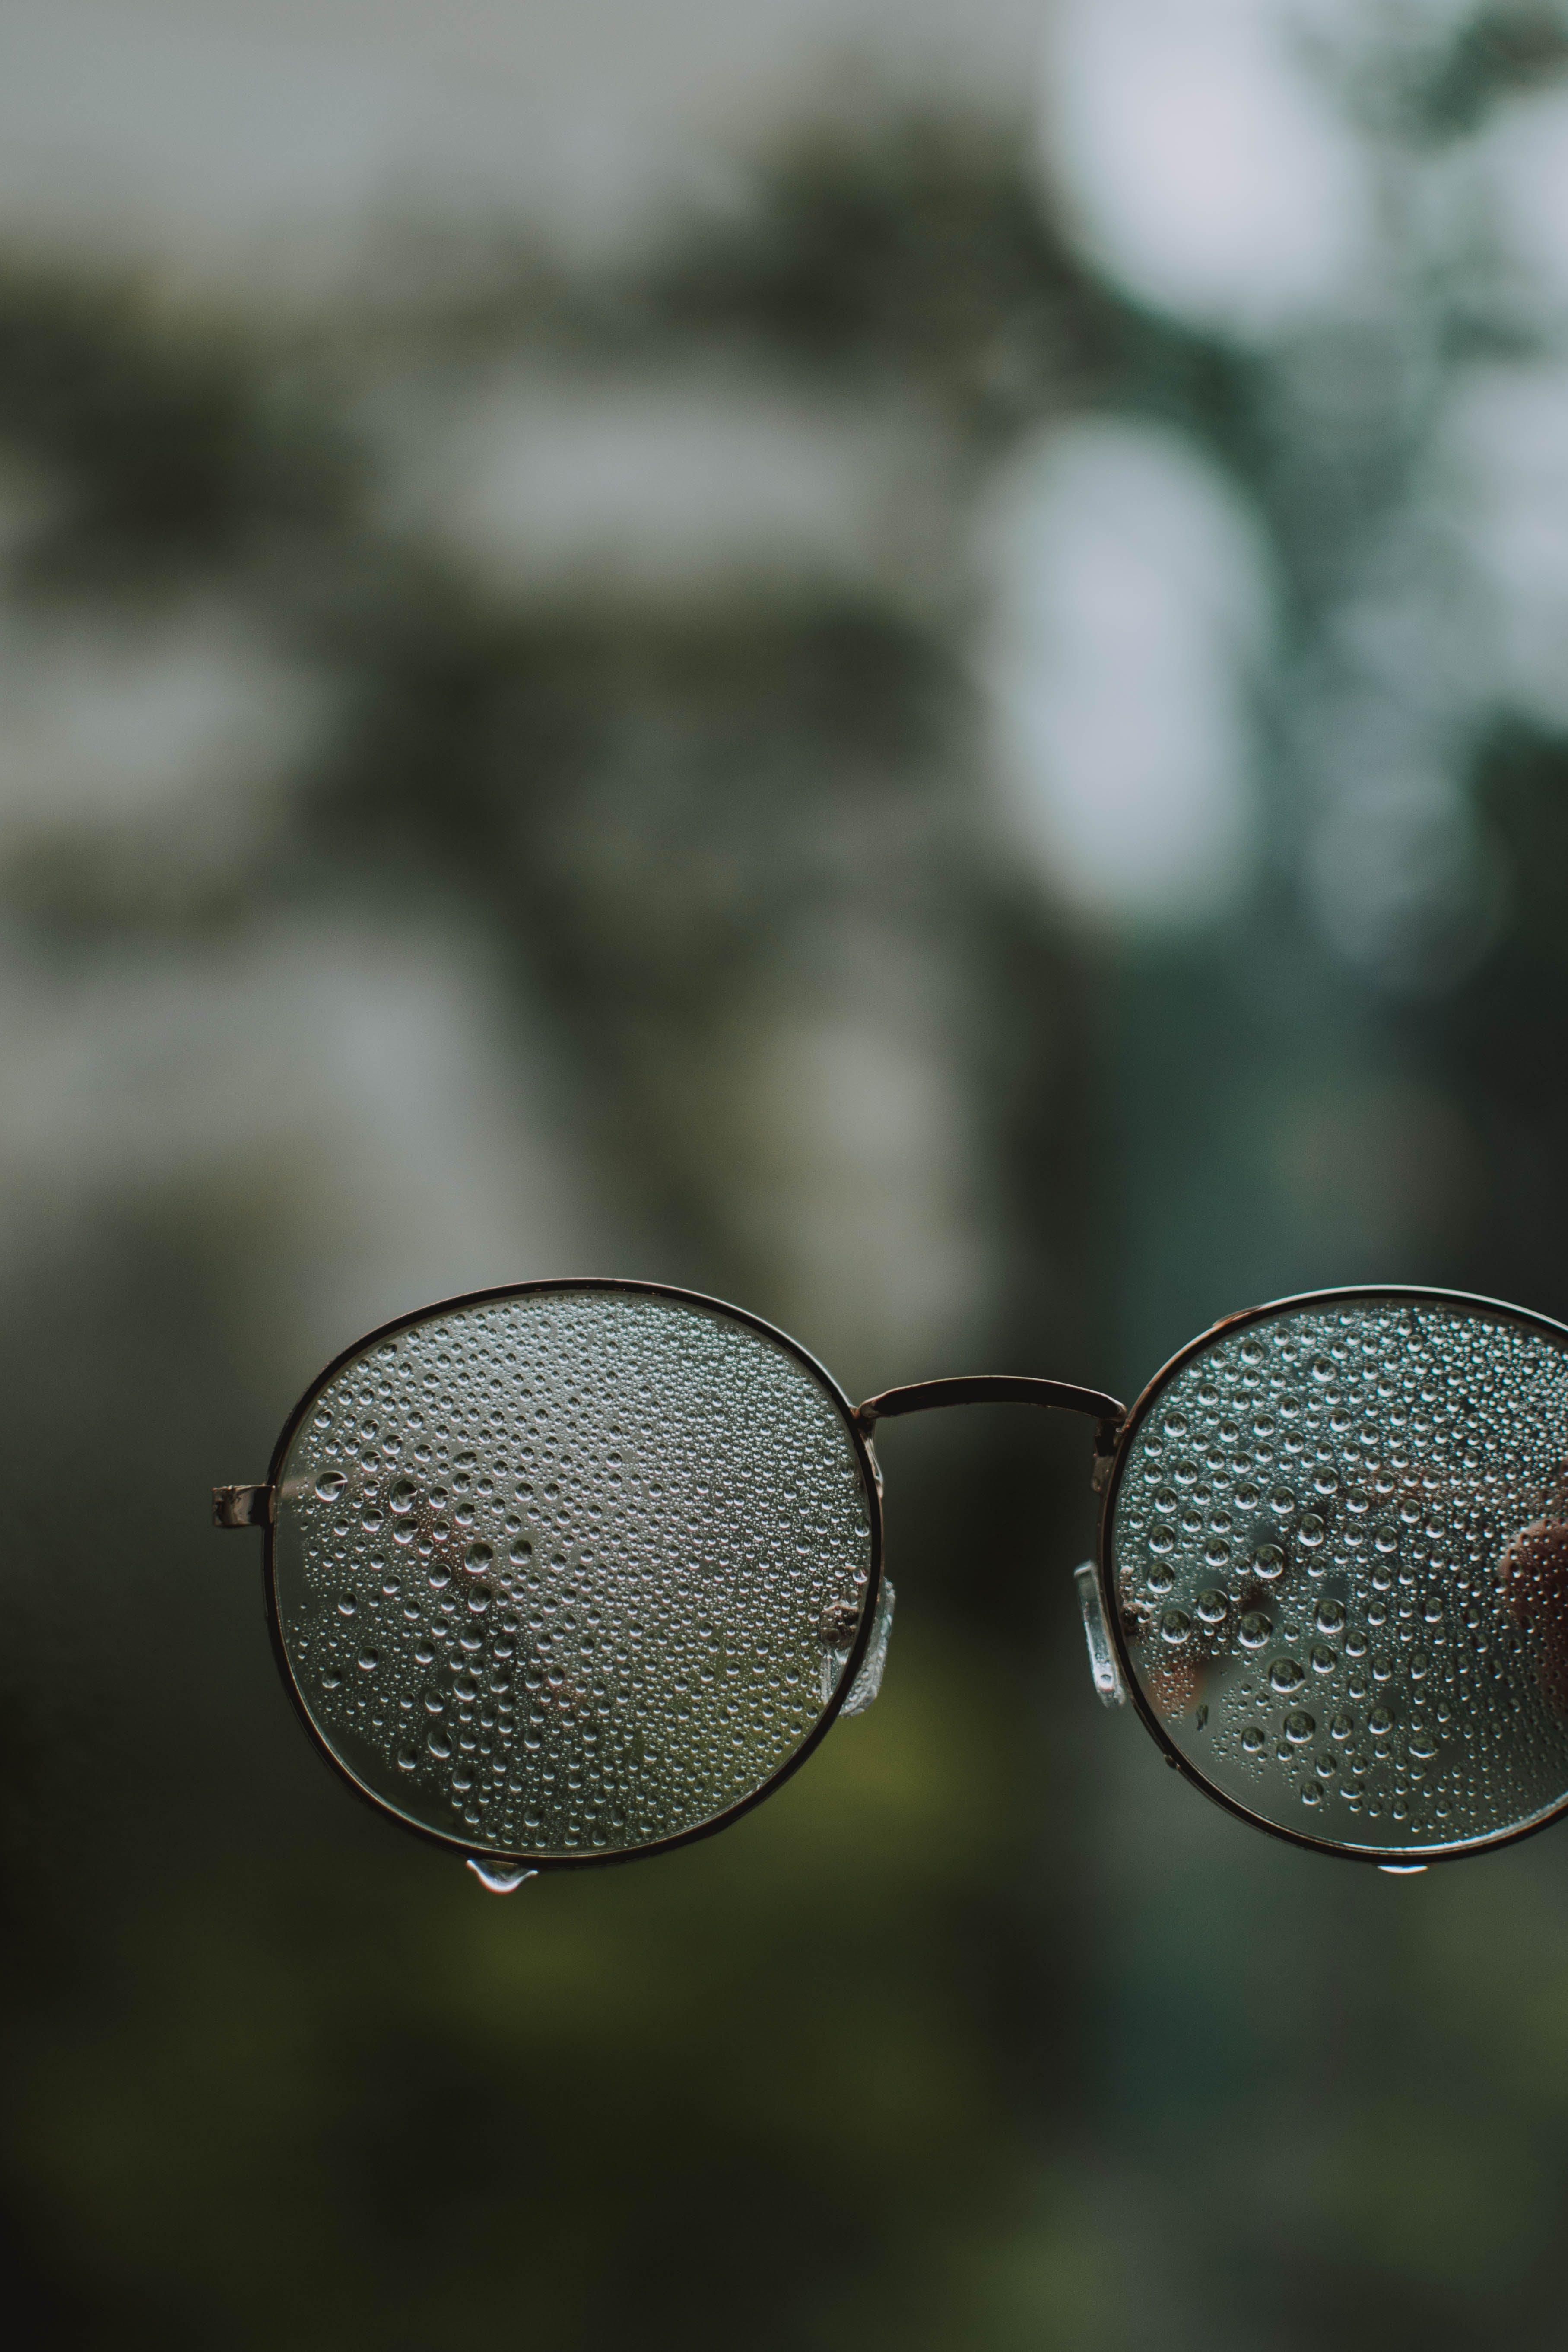 Wet Eyeglasses